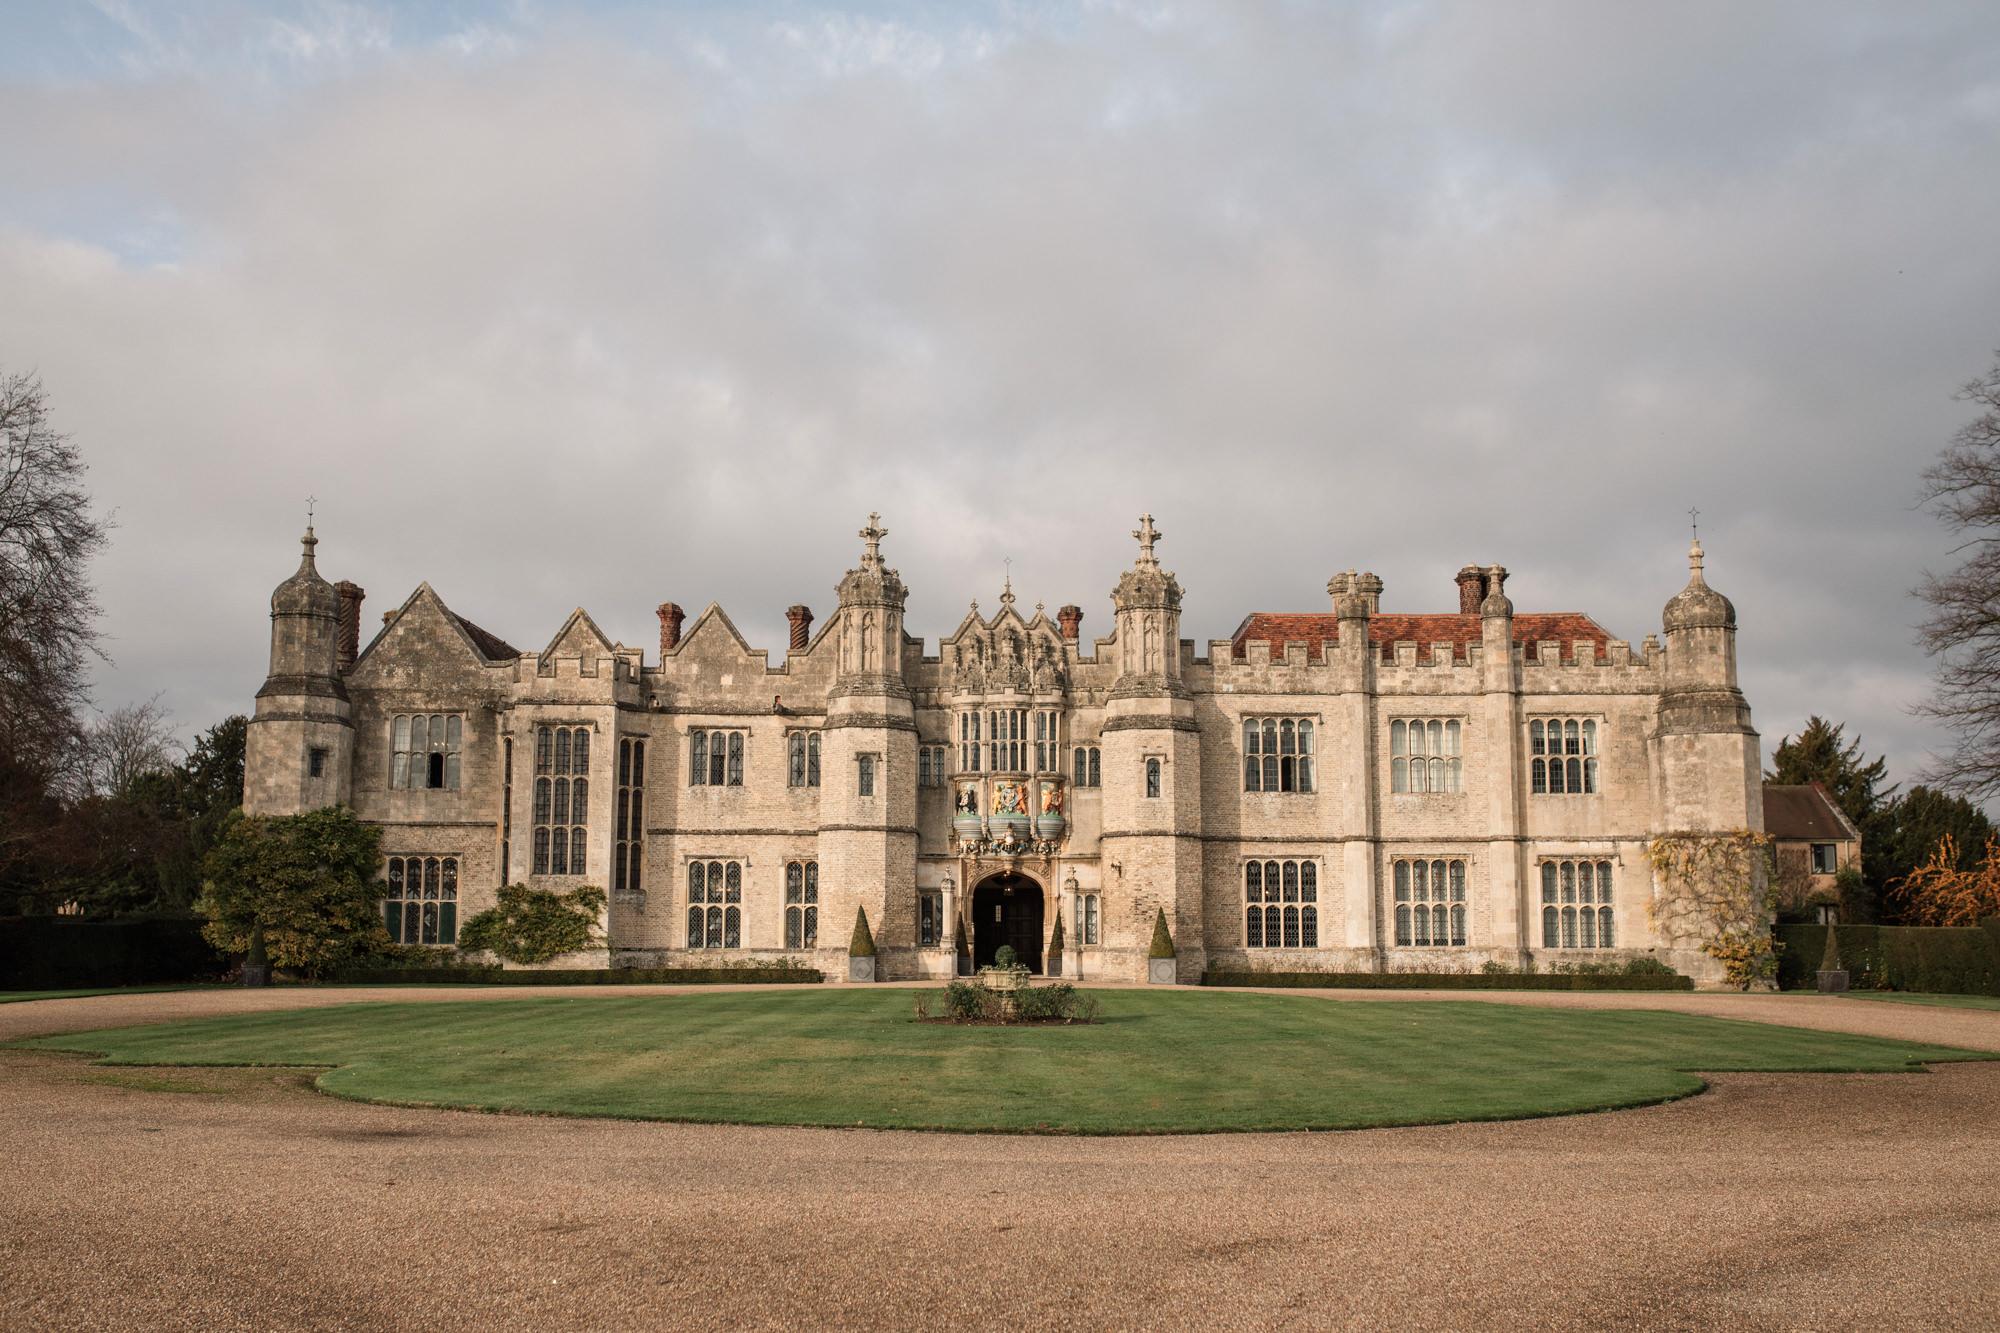 Choosing a manor house venue